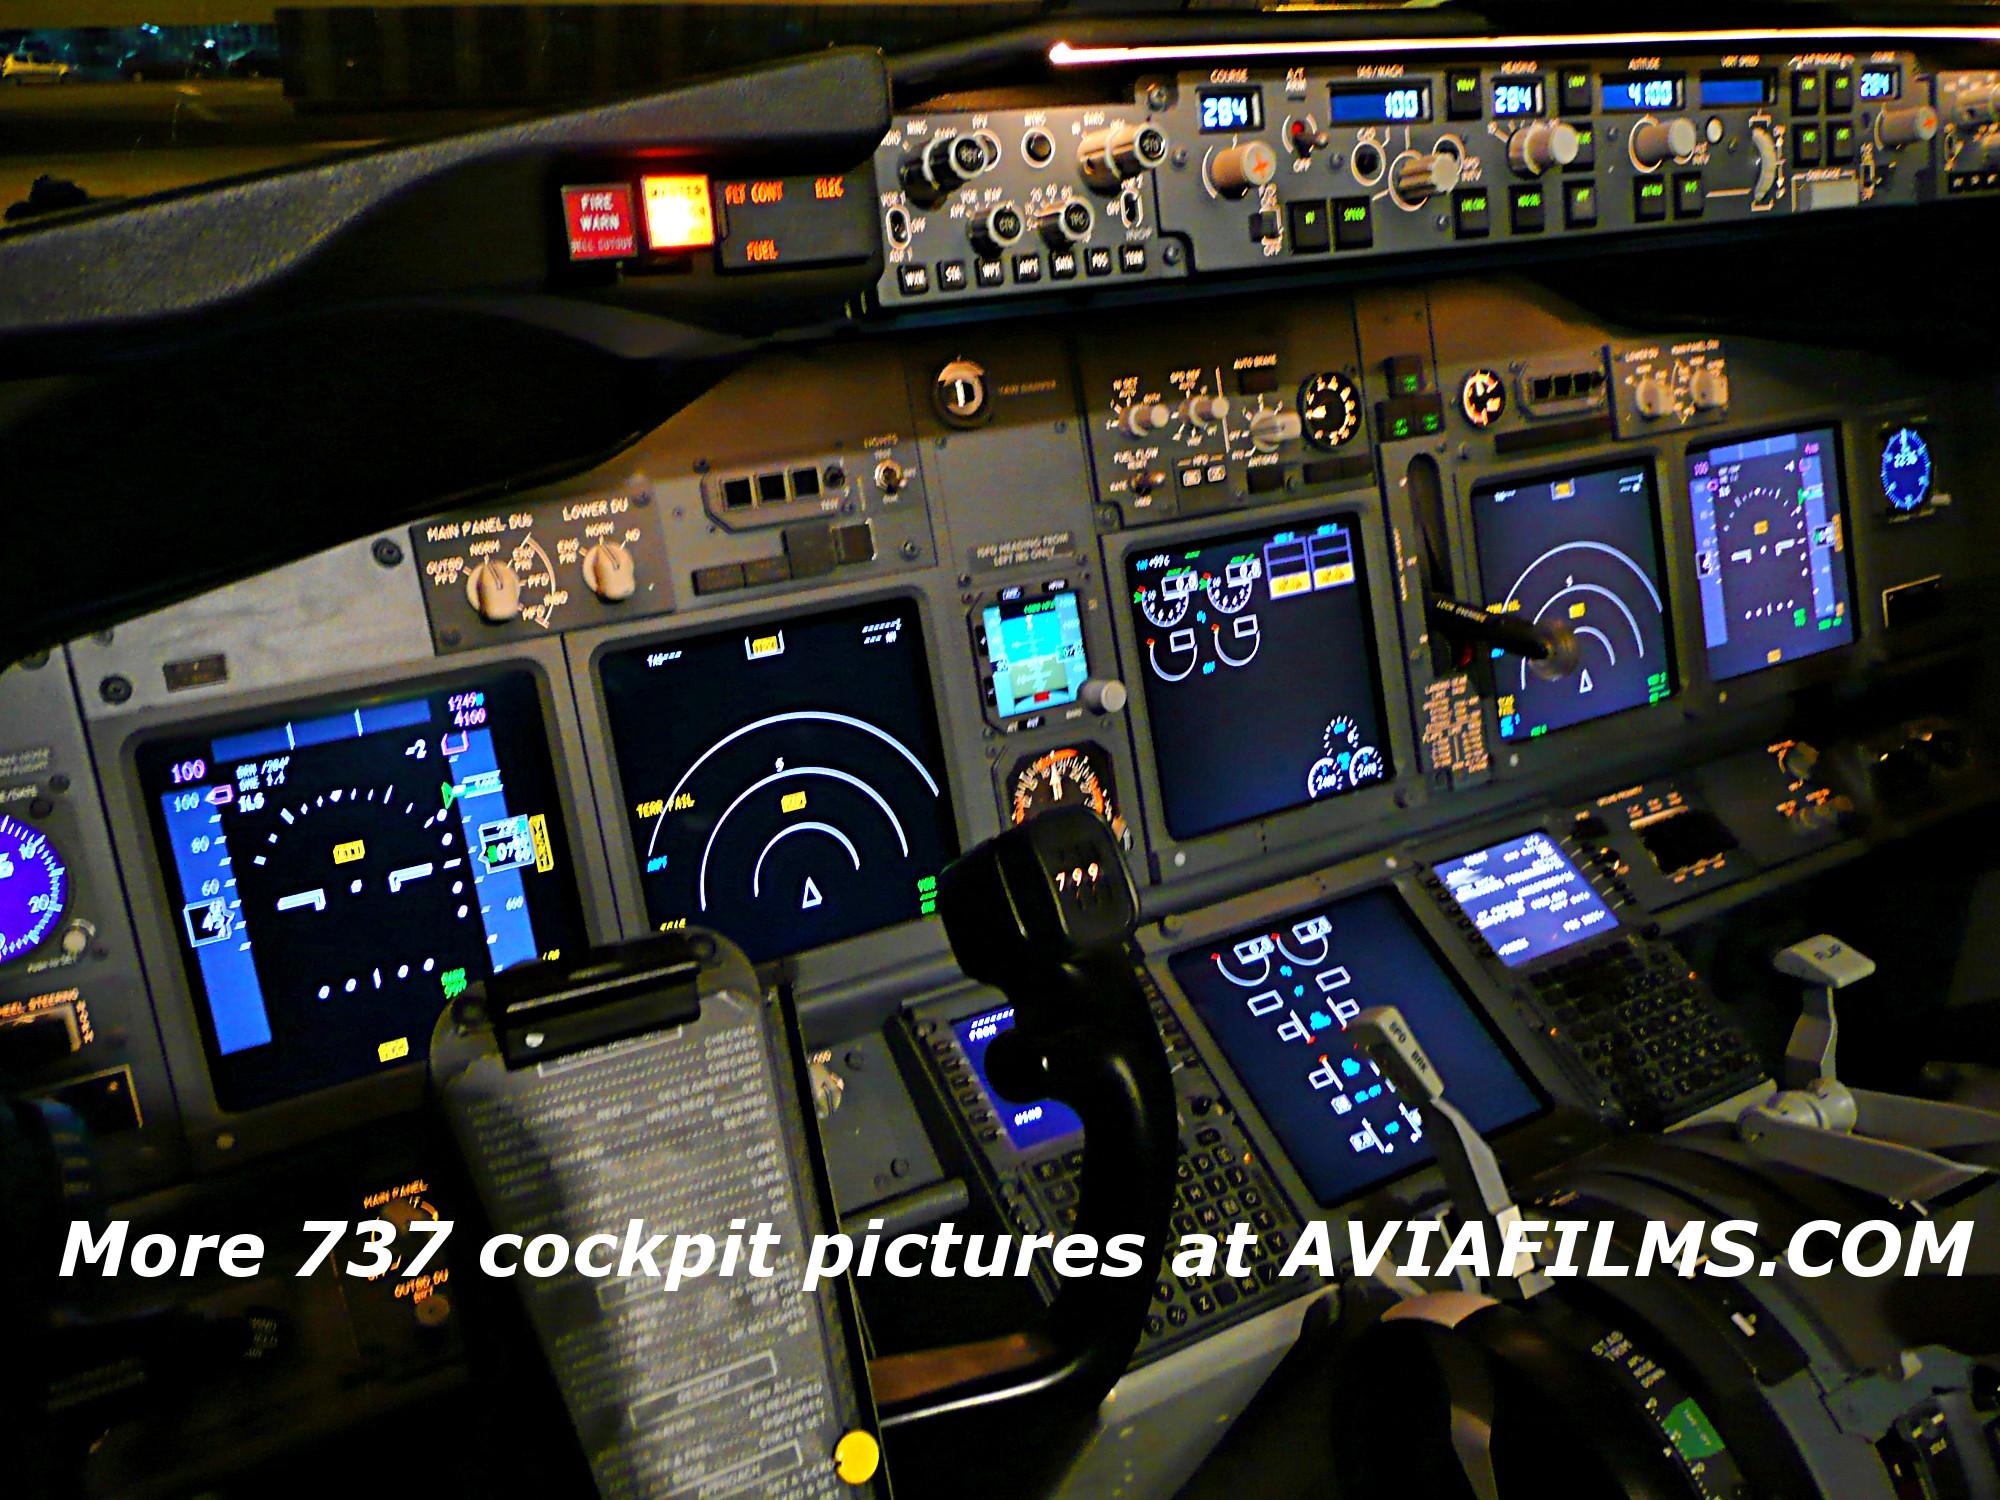 Boeing 737 Cockpit Wallpaper – WallpaperSafari